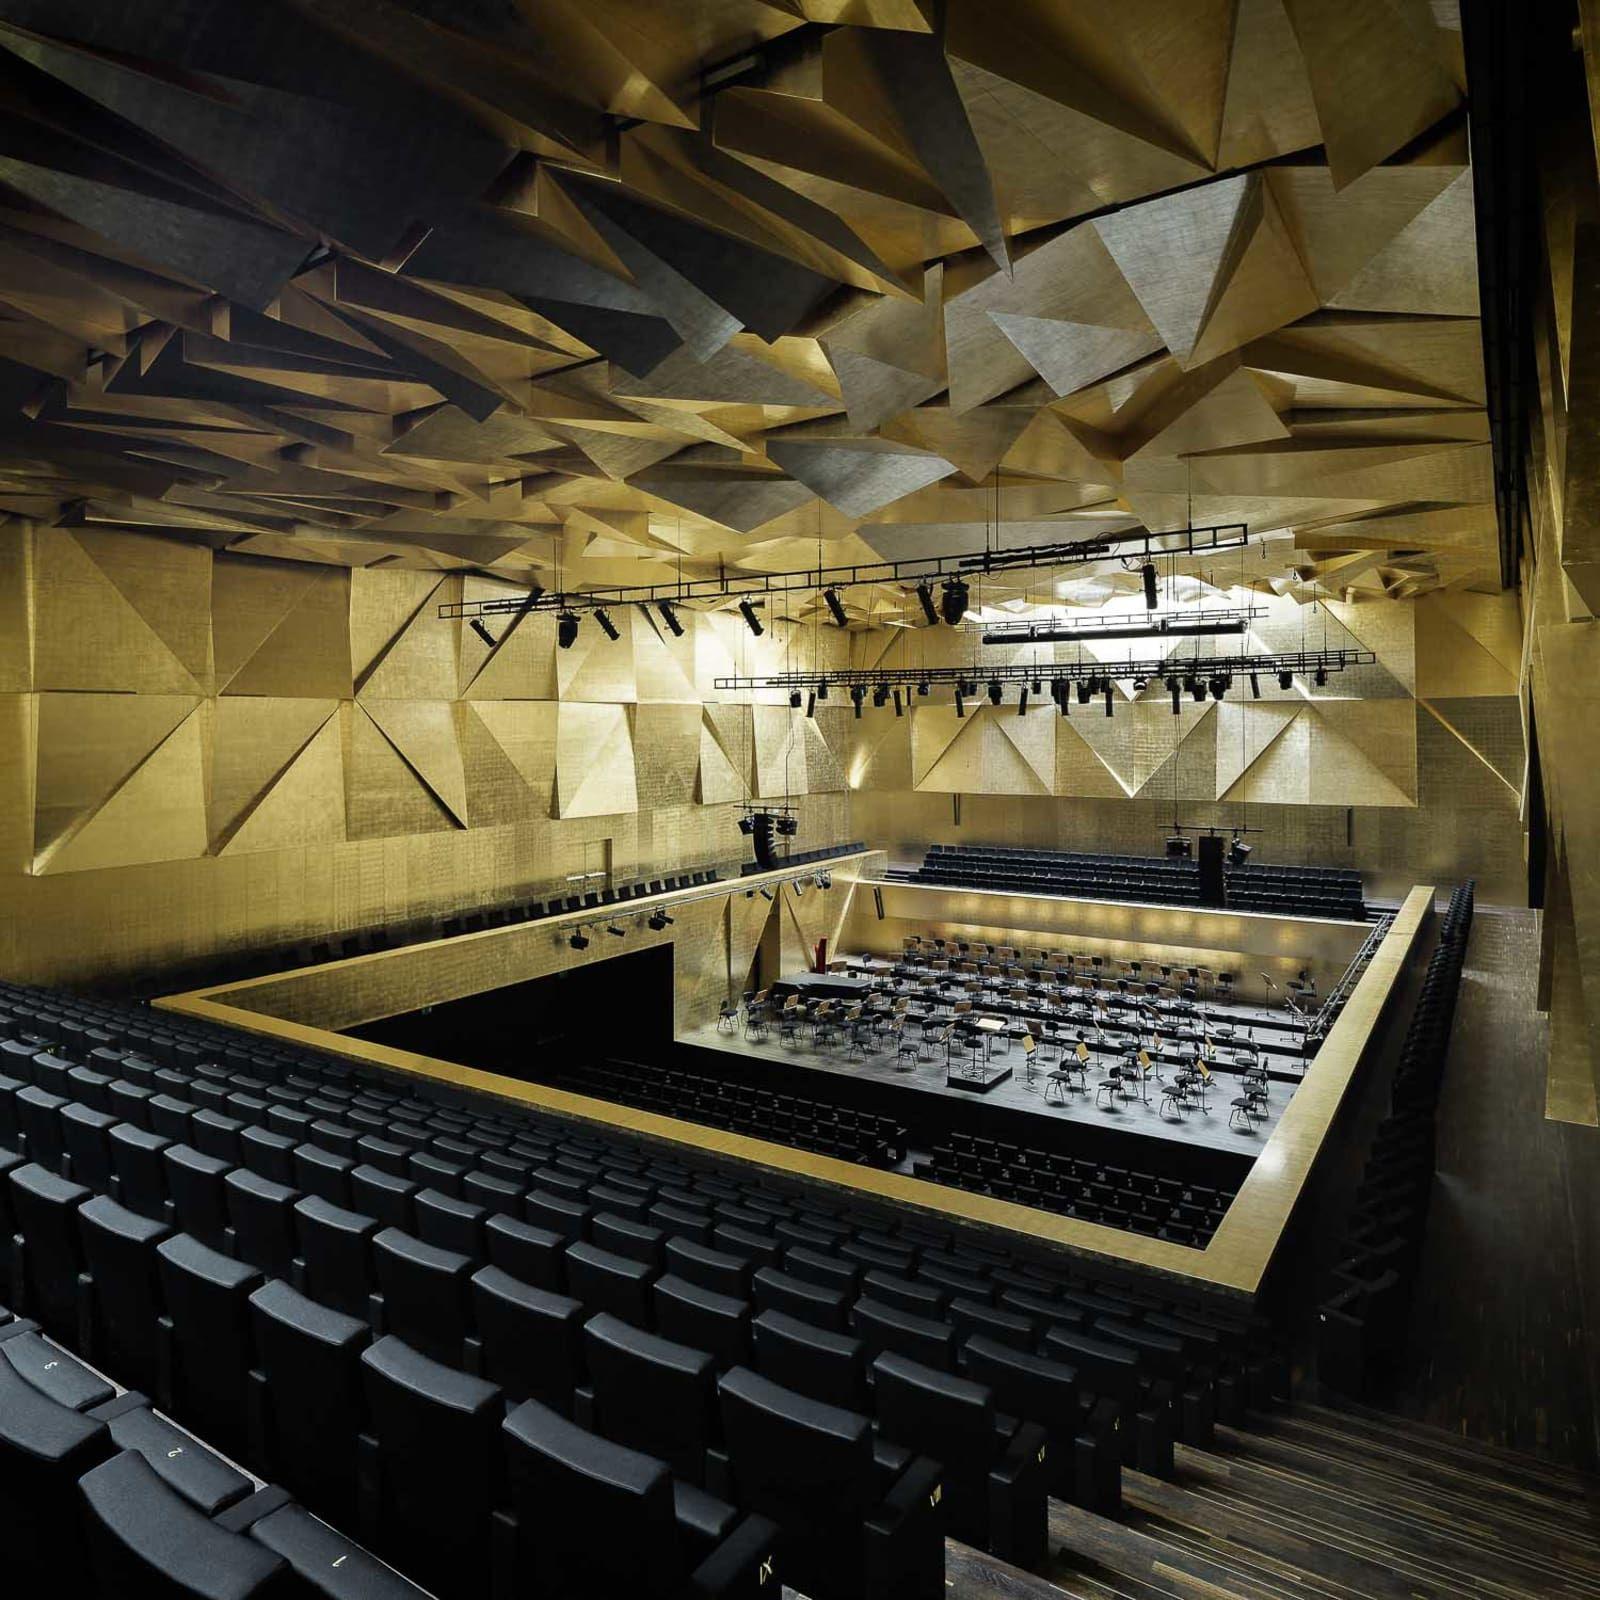 concert hall architecture Unfolding Sounds – Paris Concert Hall eVolo Architecture ° Halls ° Pinterest